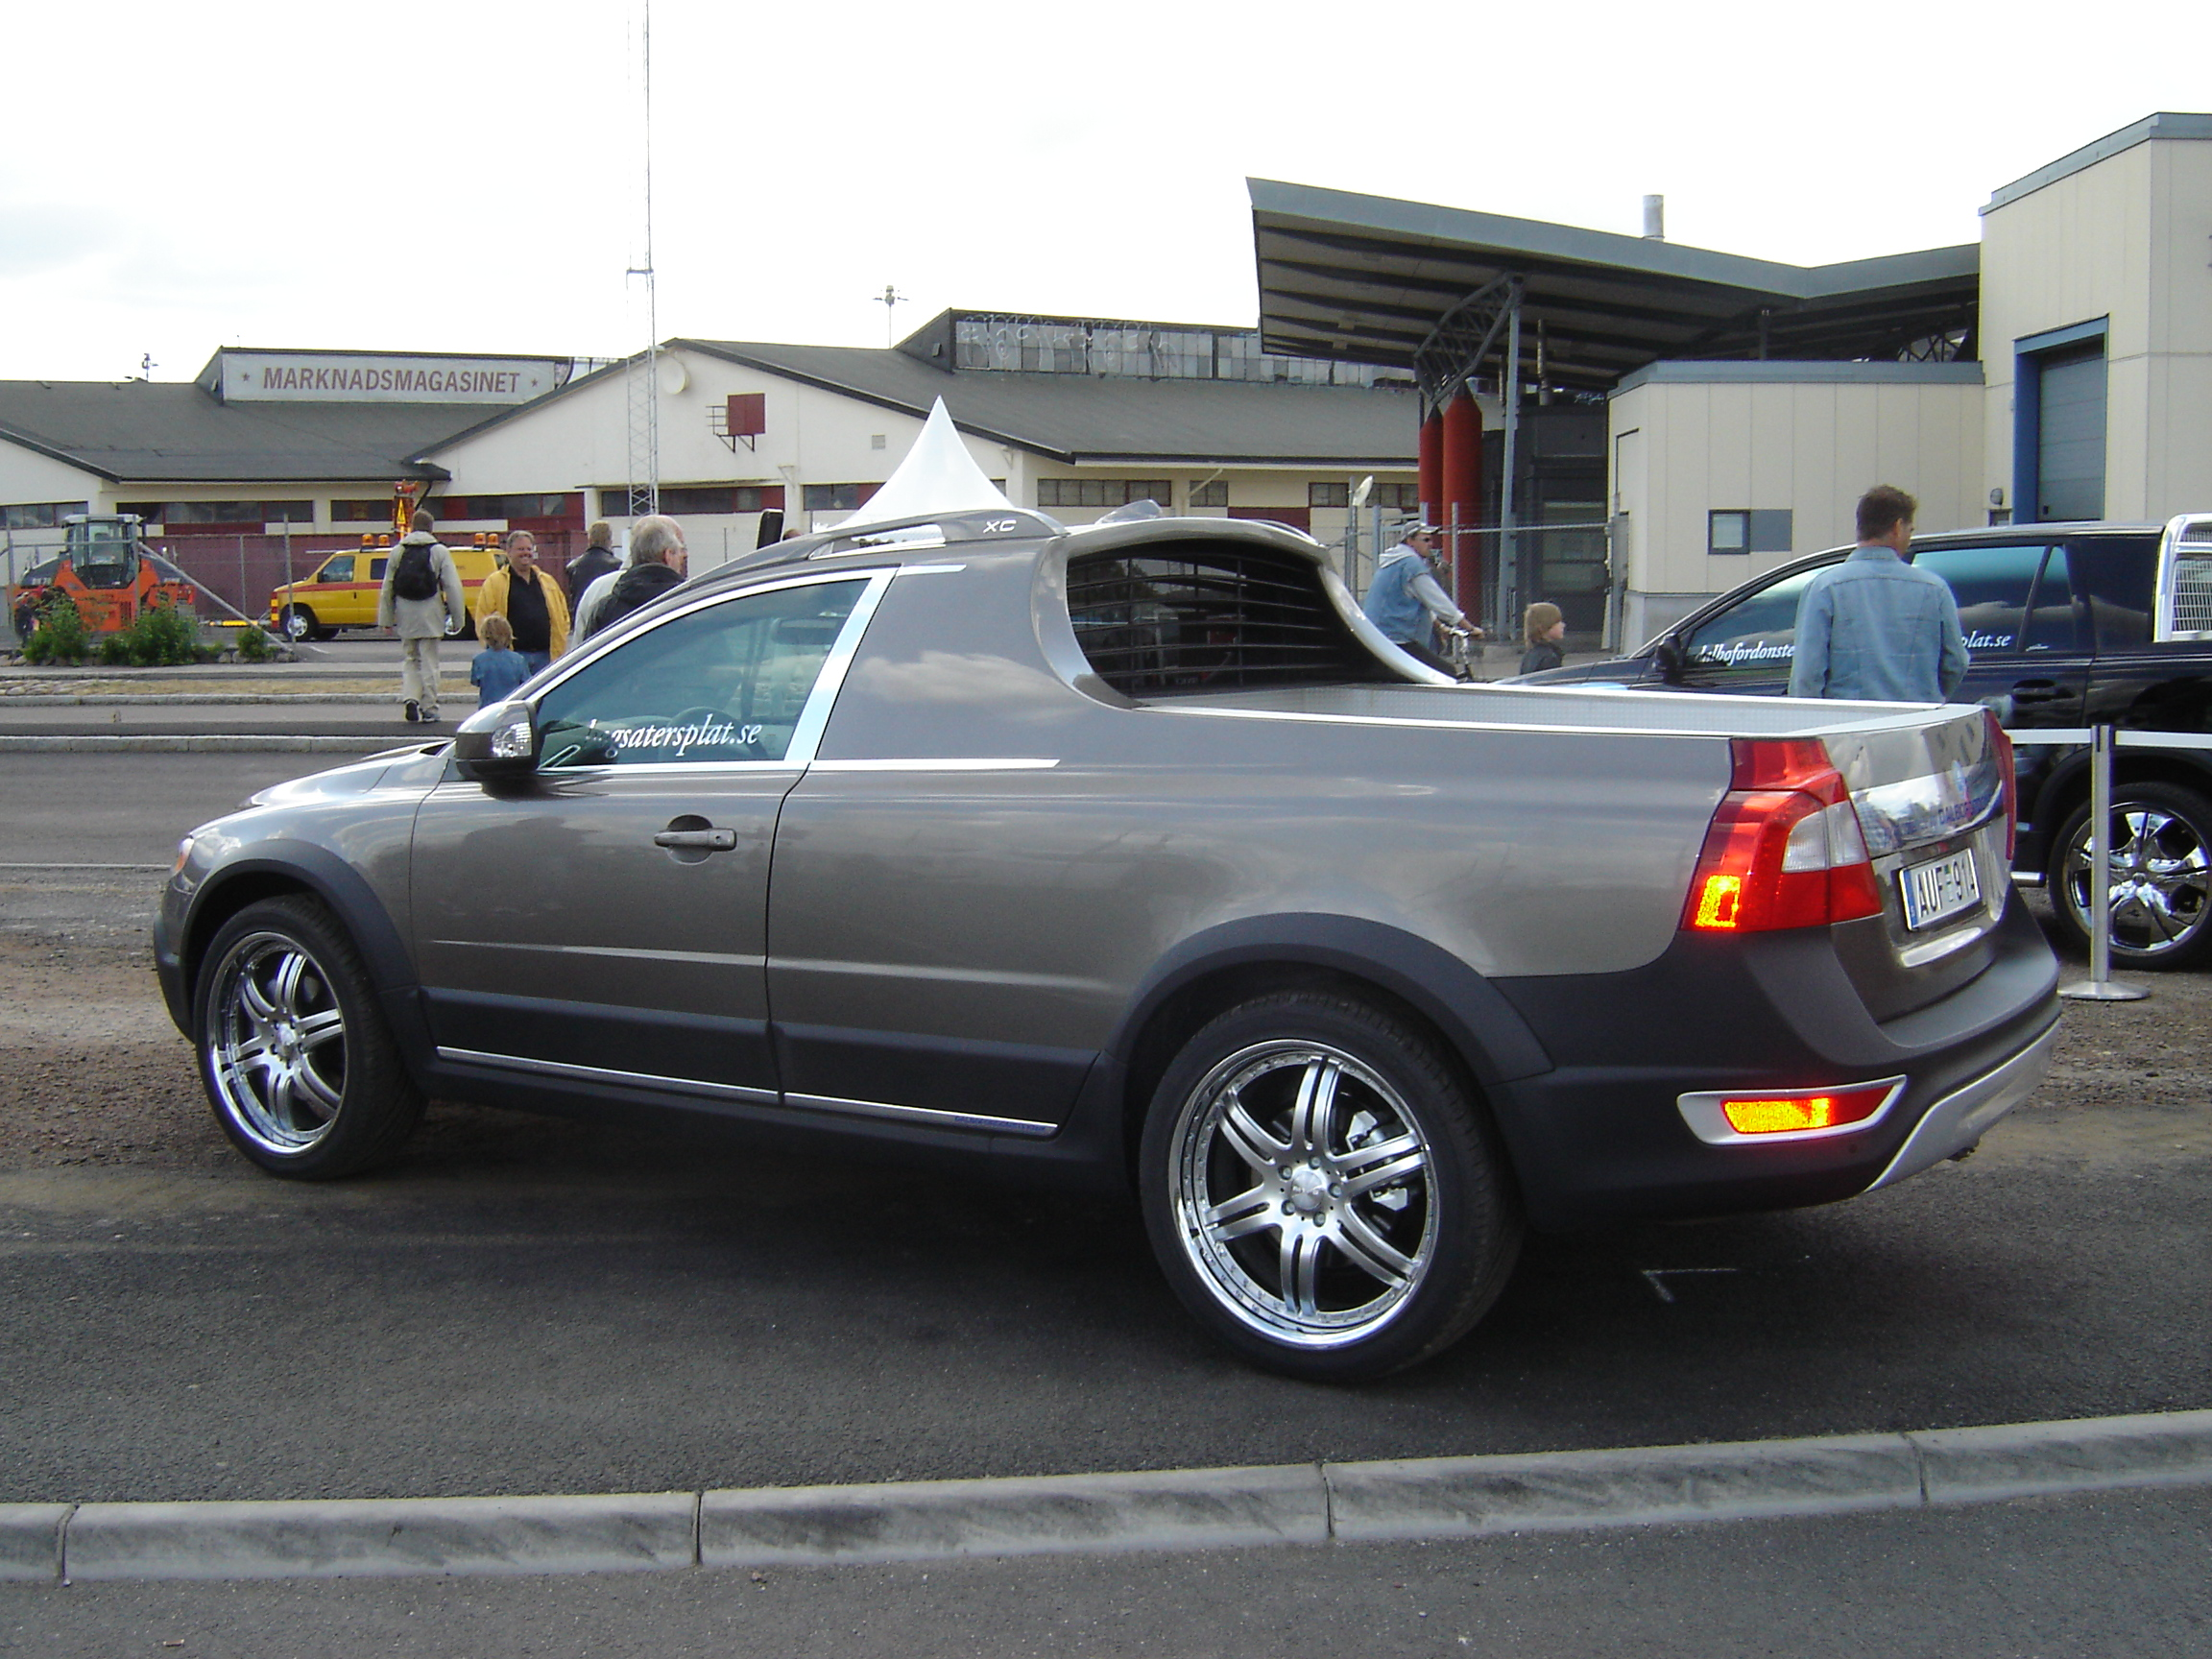 File:Volvo XC 70 Pick Up (2592380367).jpg - Wikimedia Commons